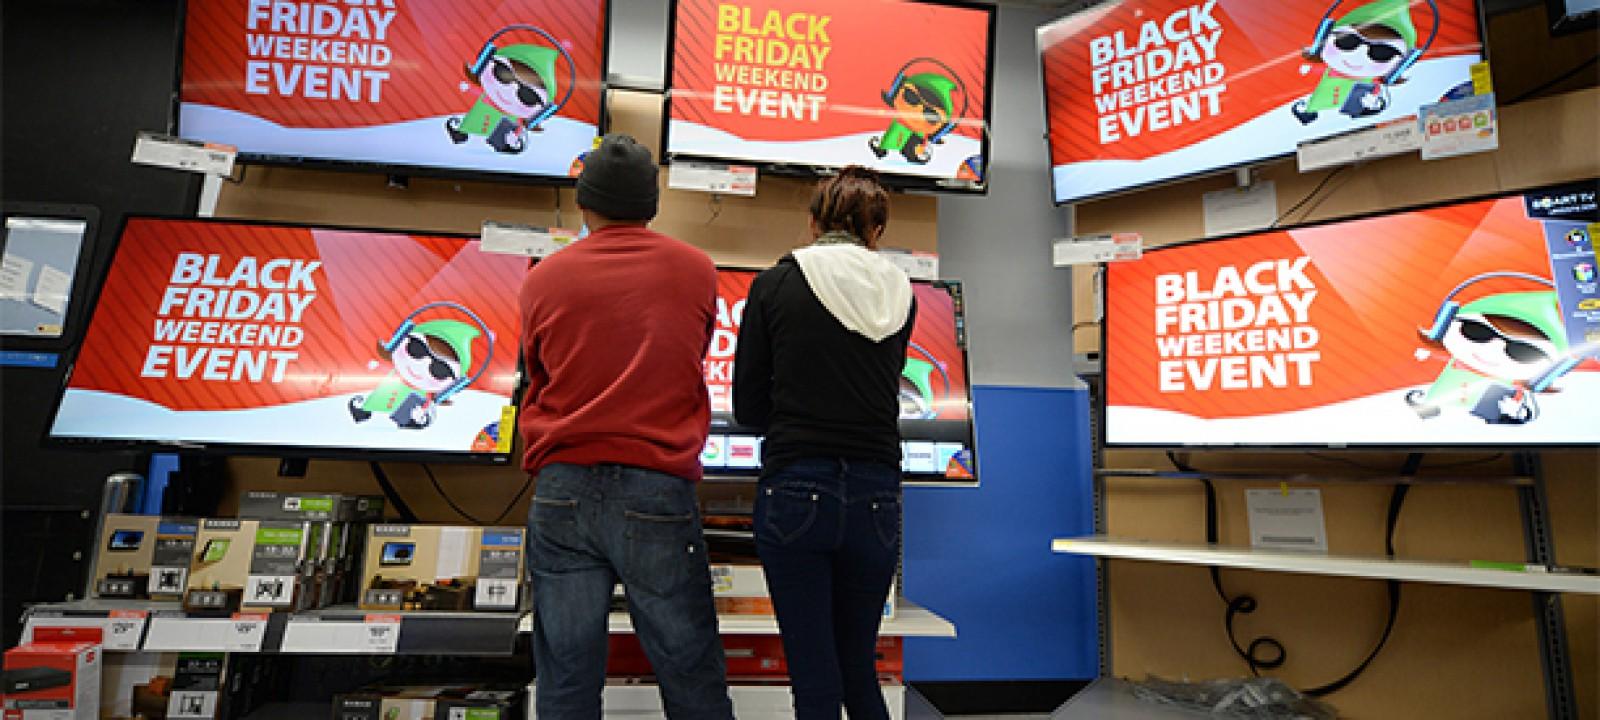 US-ECONOMY-RETAIL-BLACK FRIDAY